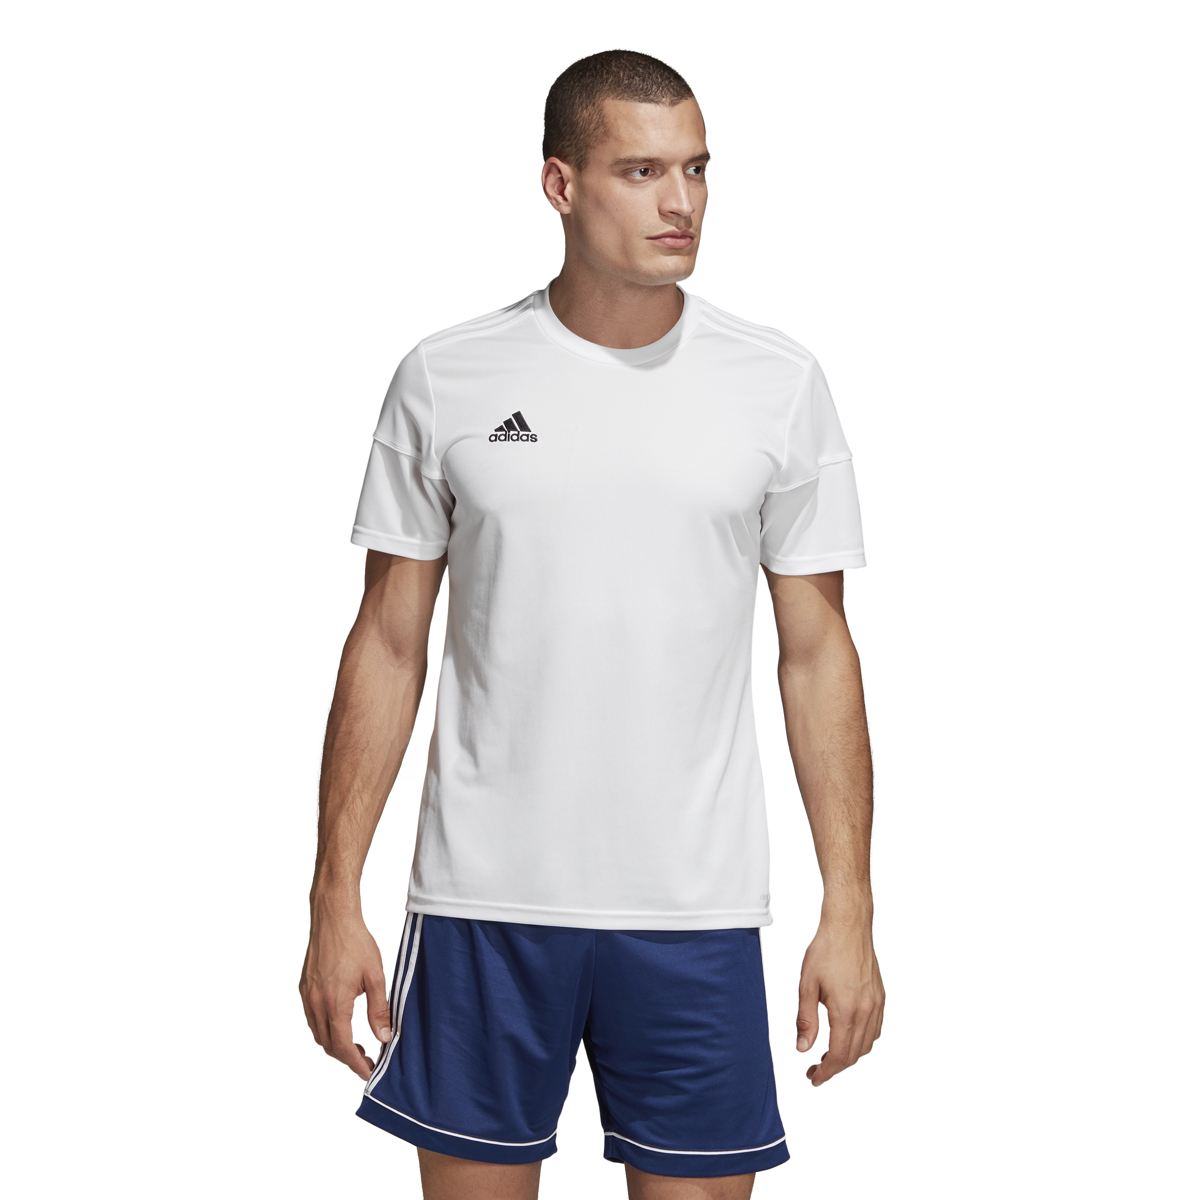 adidas Men's Squadra 17 Jerseys